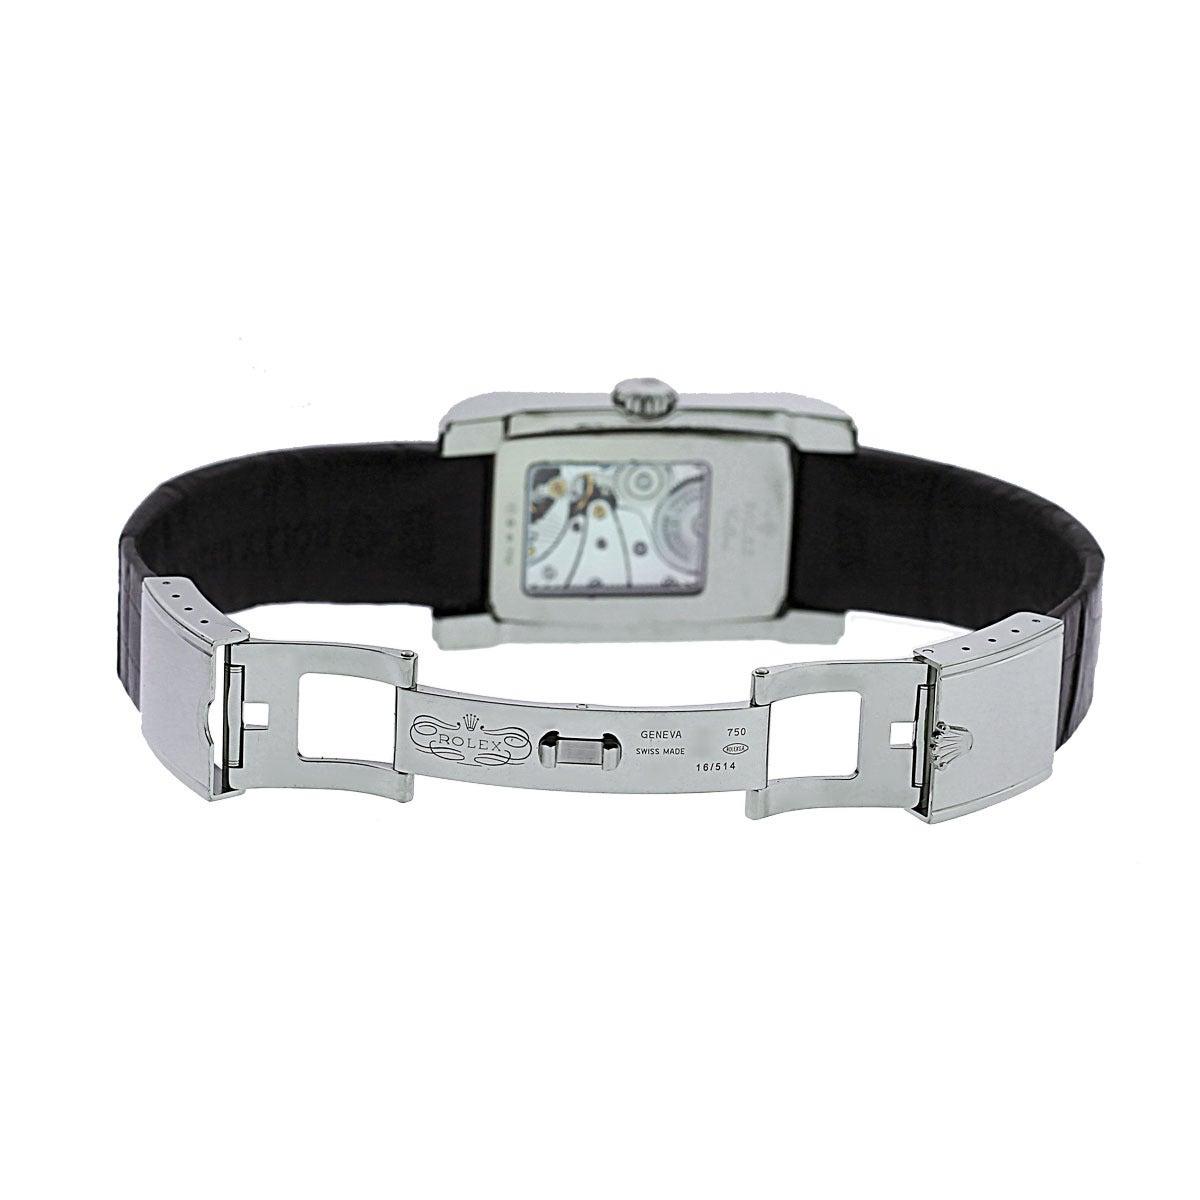 Rolex White Gold Cellini Prince Automatic Wristwatch Ref 5443/9 In Excellent Condition For Sale In Boca Raton, FL